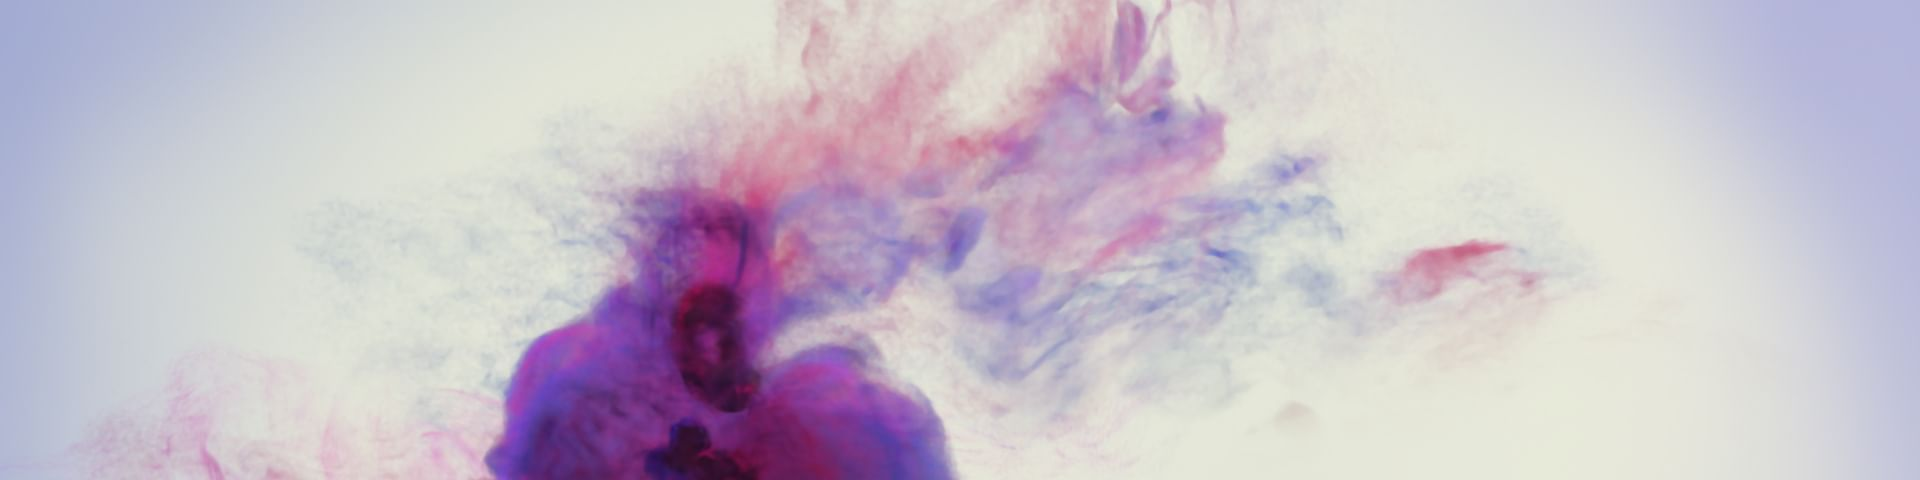 Festival Metal Oper'Art - Livestream